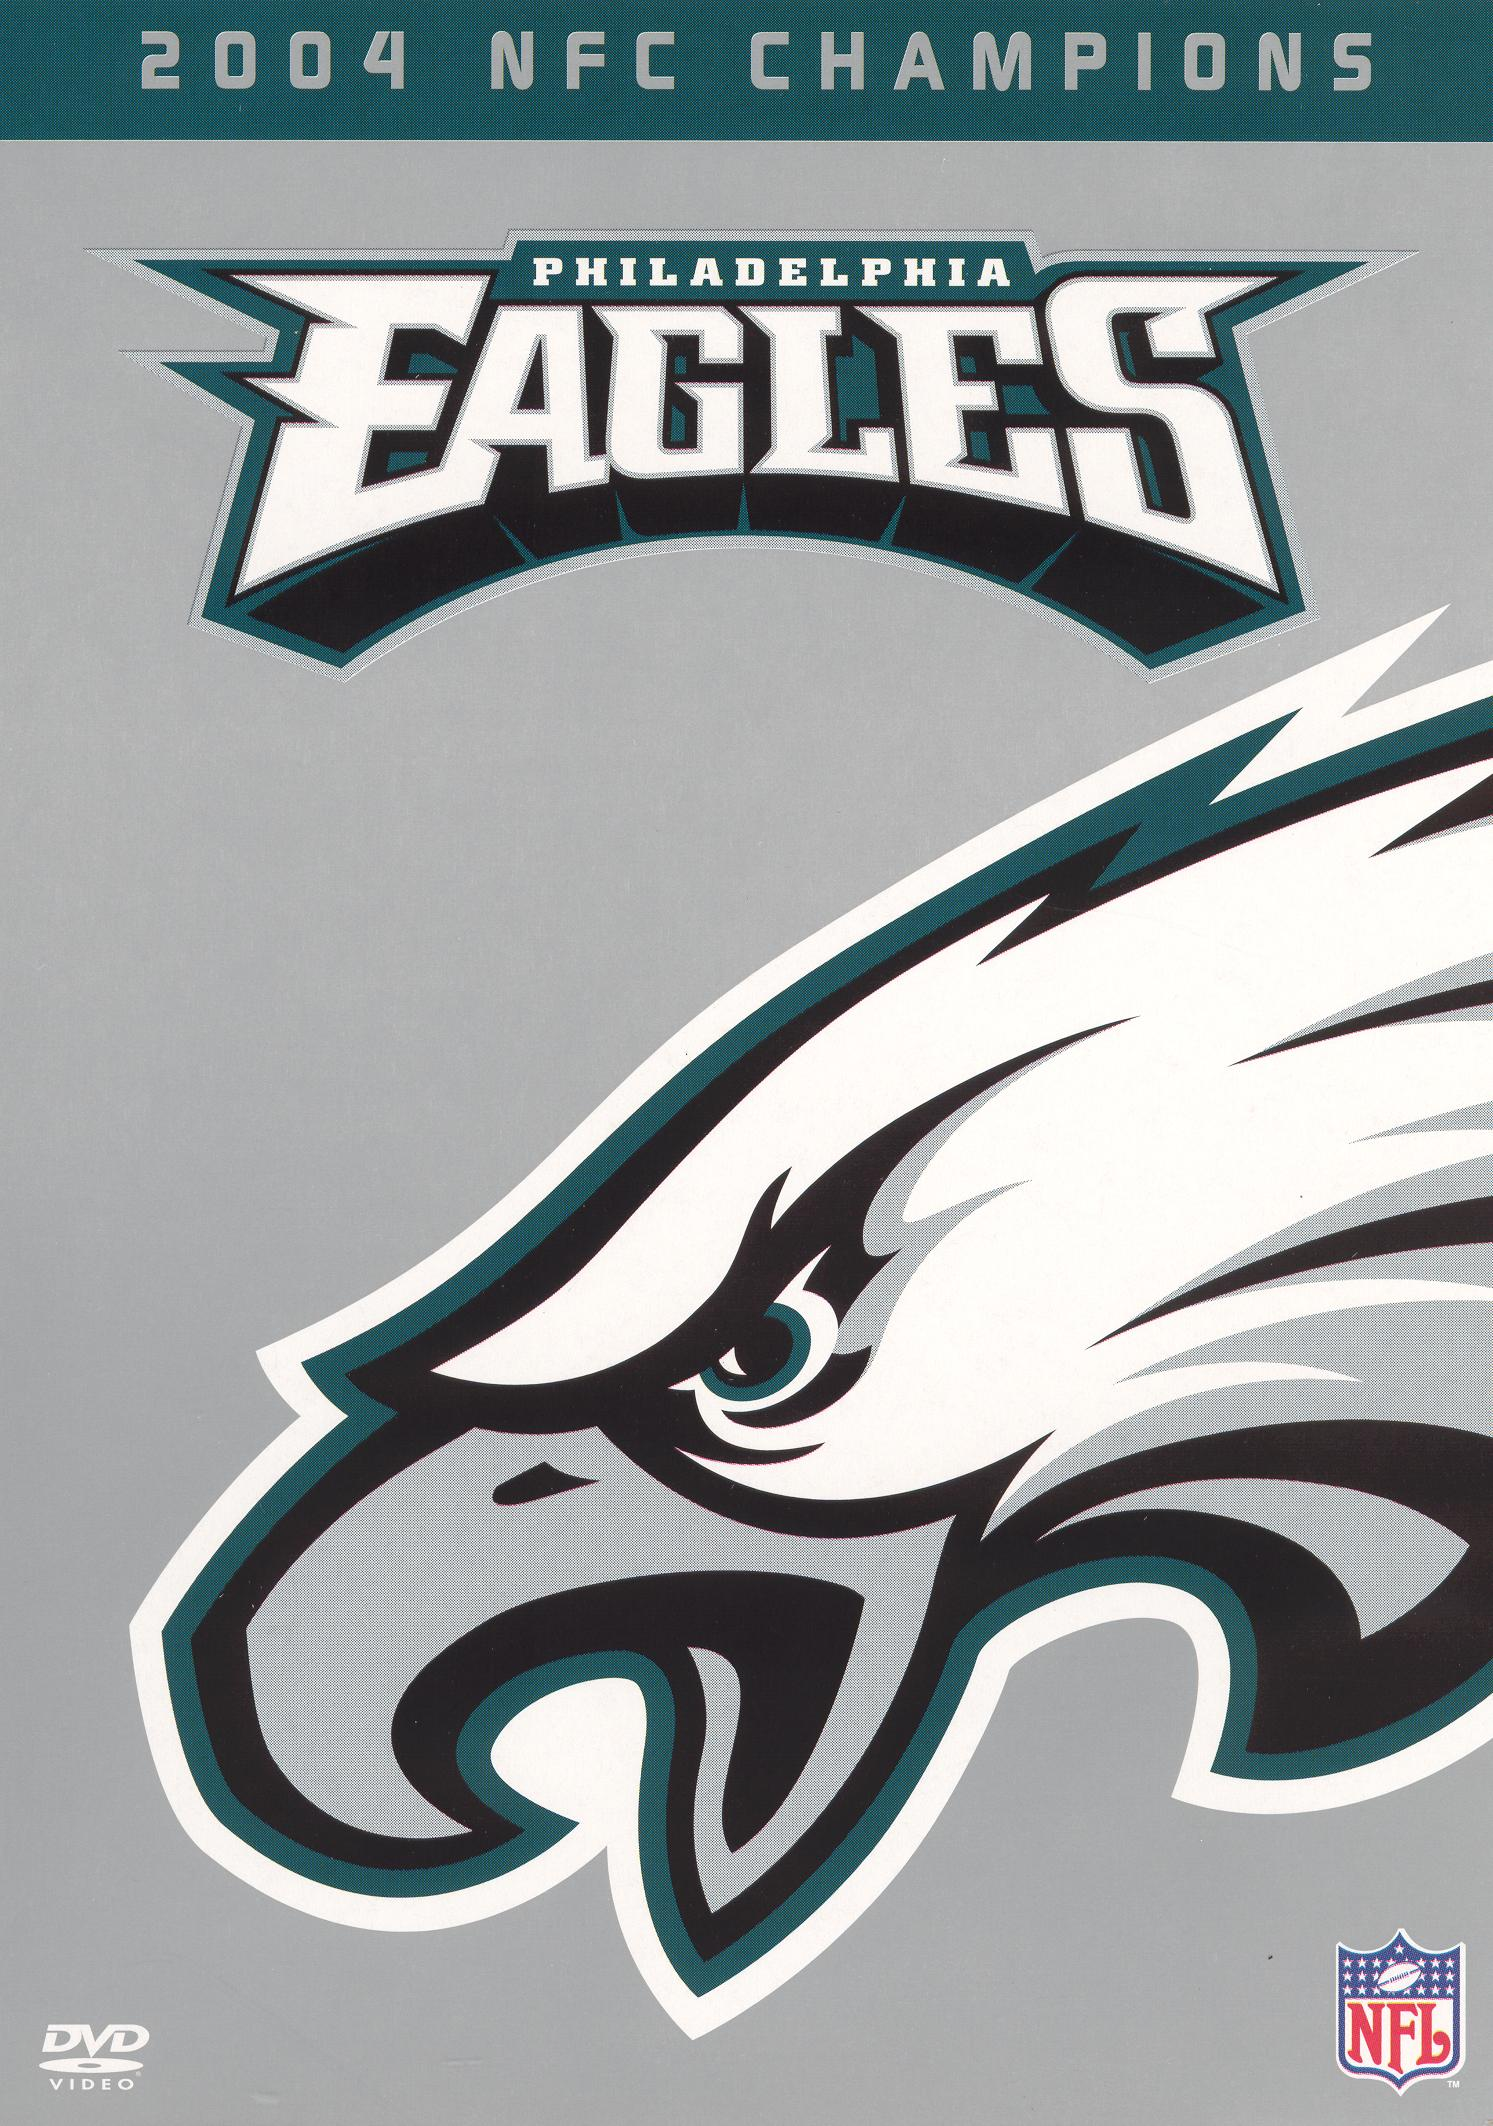 NFL: Philadelphia Eagles - 2004 NFC Champions